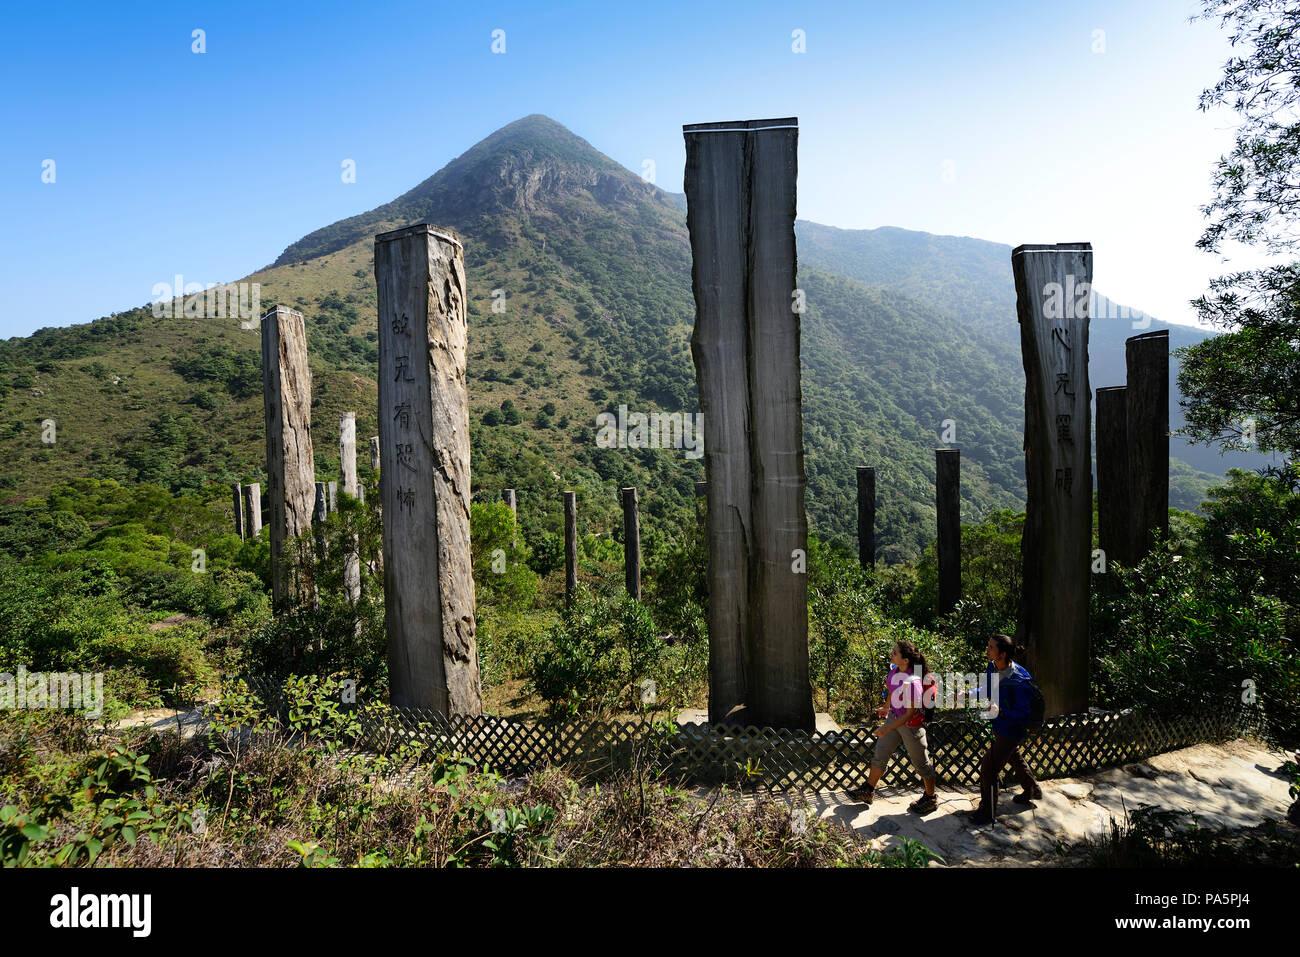 Hikers in front of wooden stelae at Wisdom Path, Lantau Peak, Lantau Island, Hong Kong, China - Stock Image